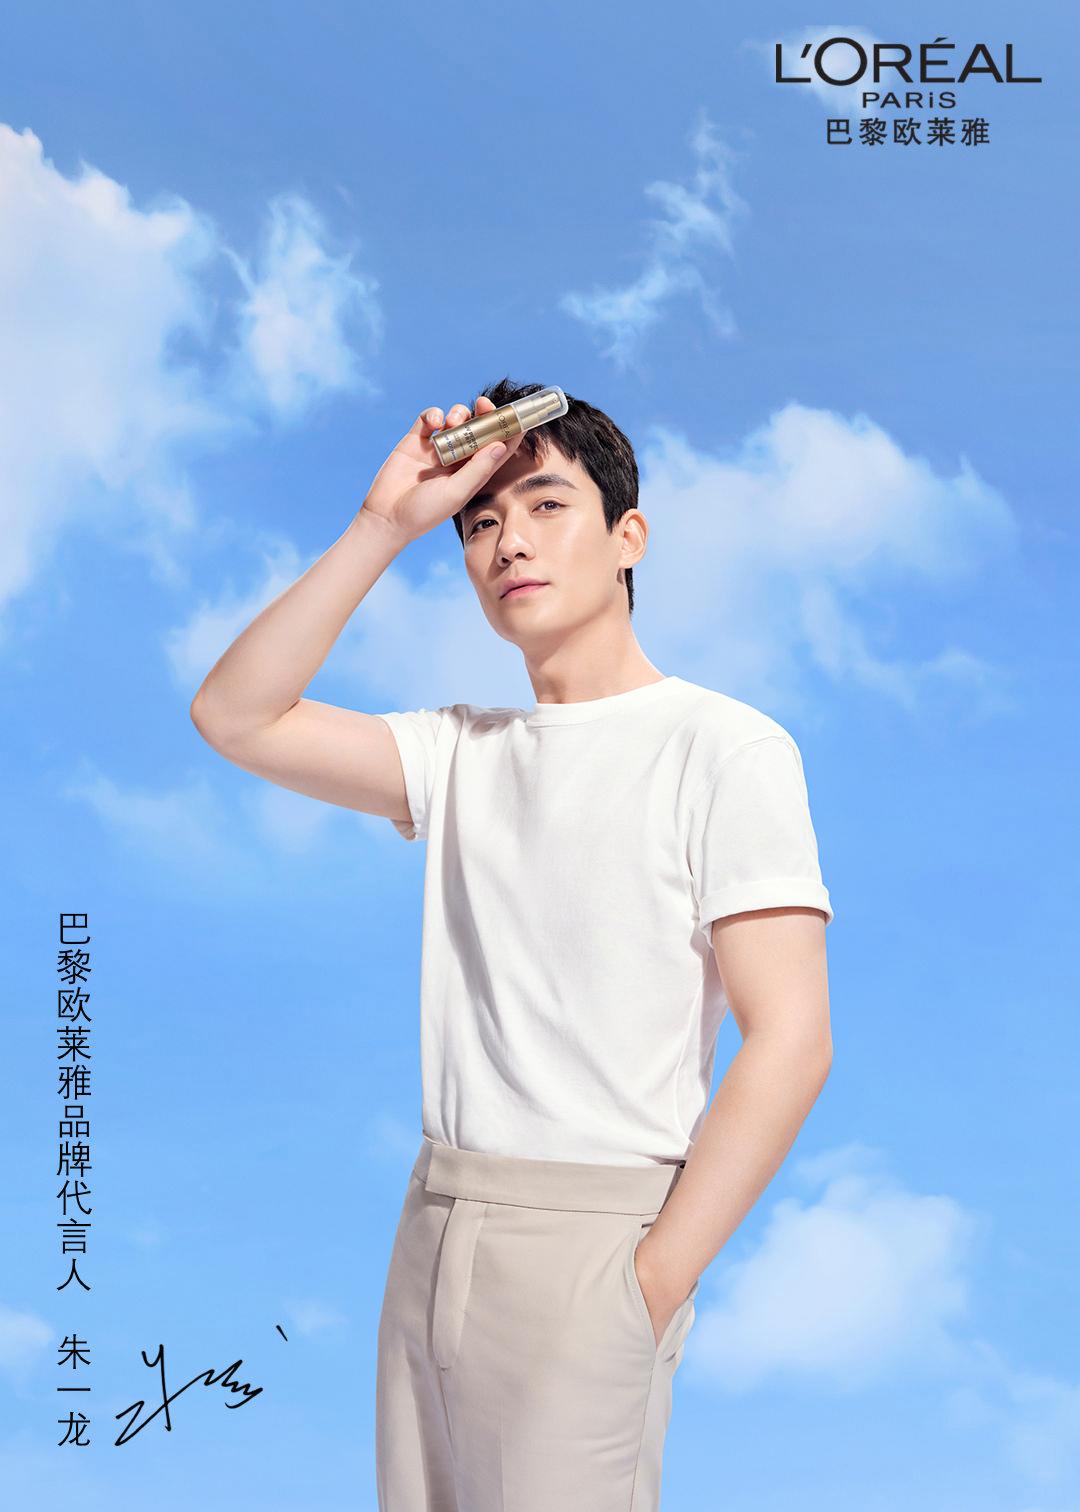 L'Oreal_zhuyilong_1